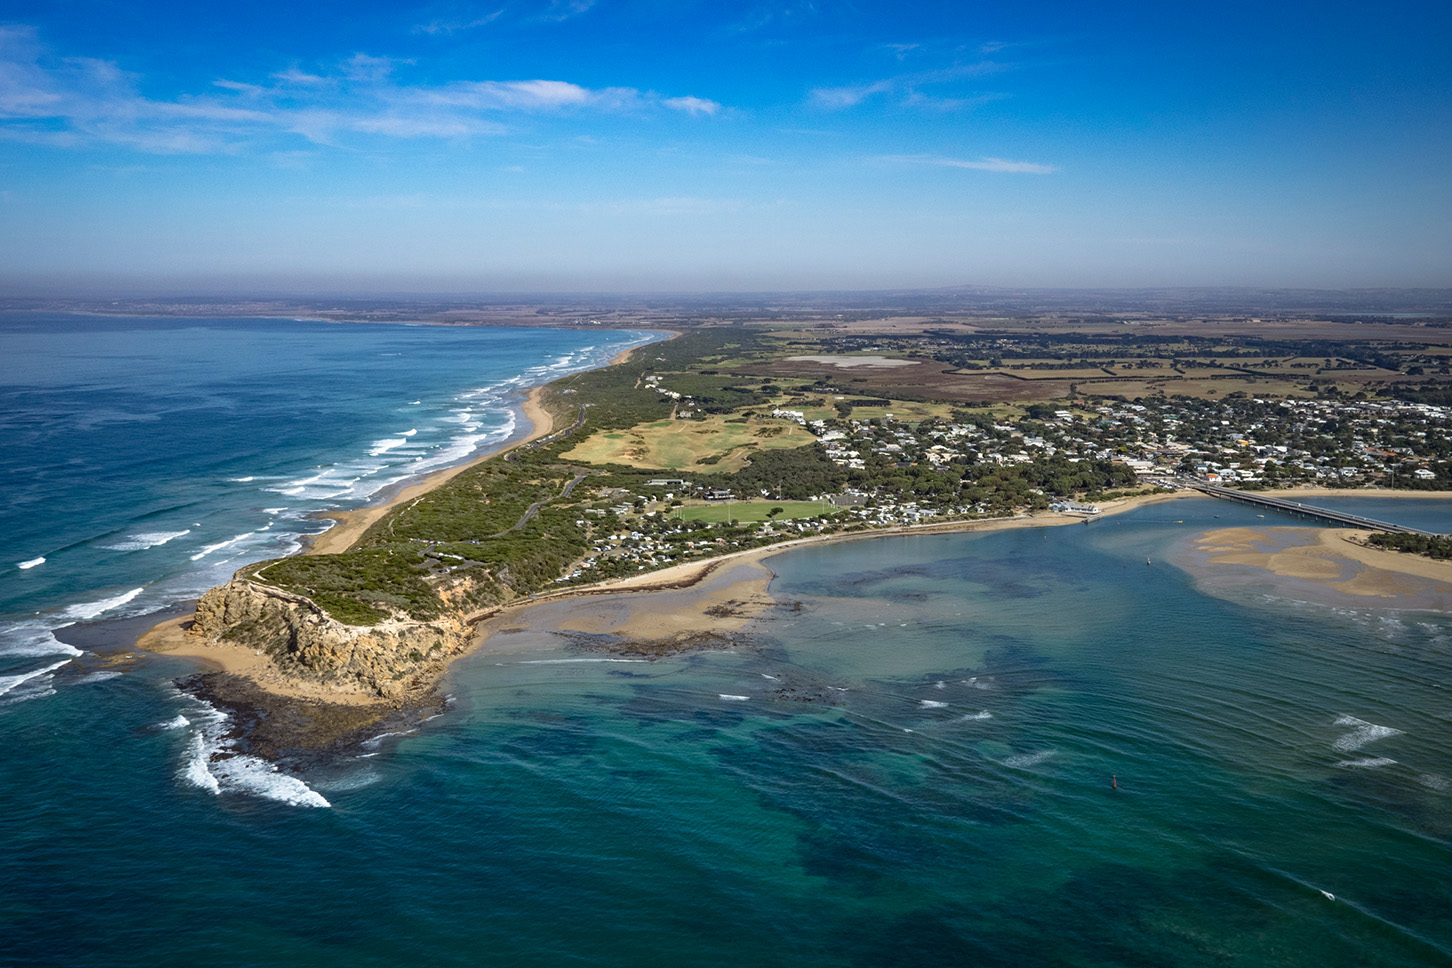 BH Coastal Aerial